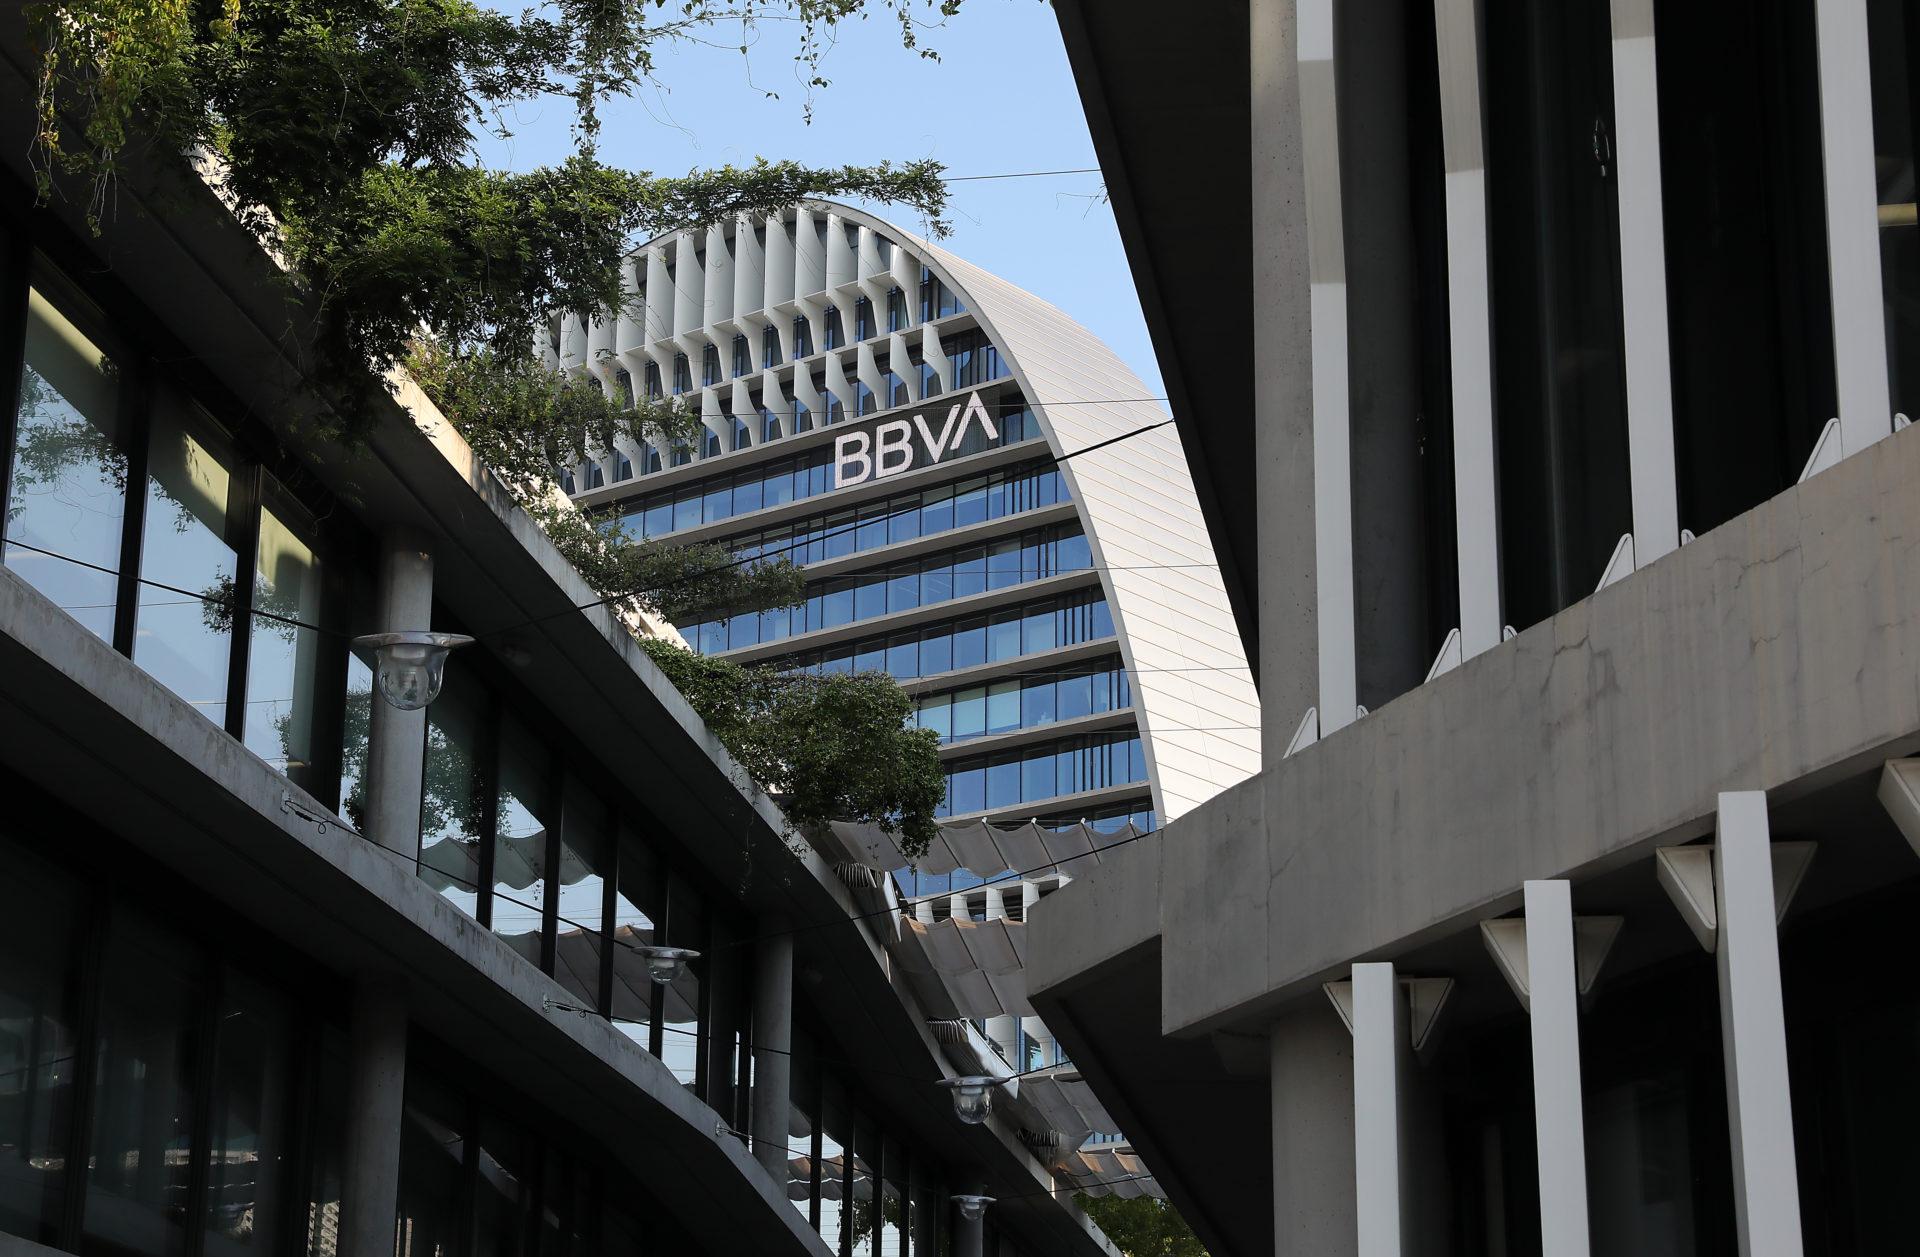 https://shareholdersandinvestors.bbva.com/wp-content/uploads/2020/01/ciudad-bbva-vela-logo-bbva-1920x1257.jpg